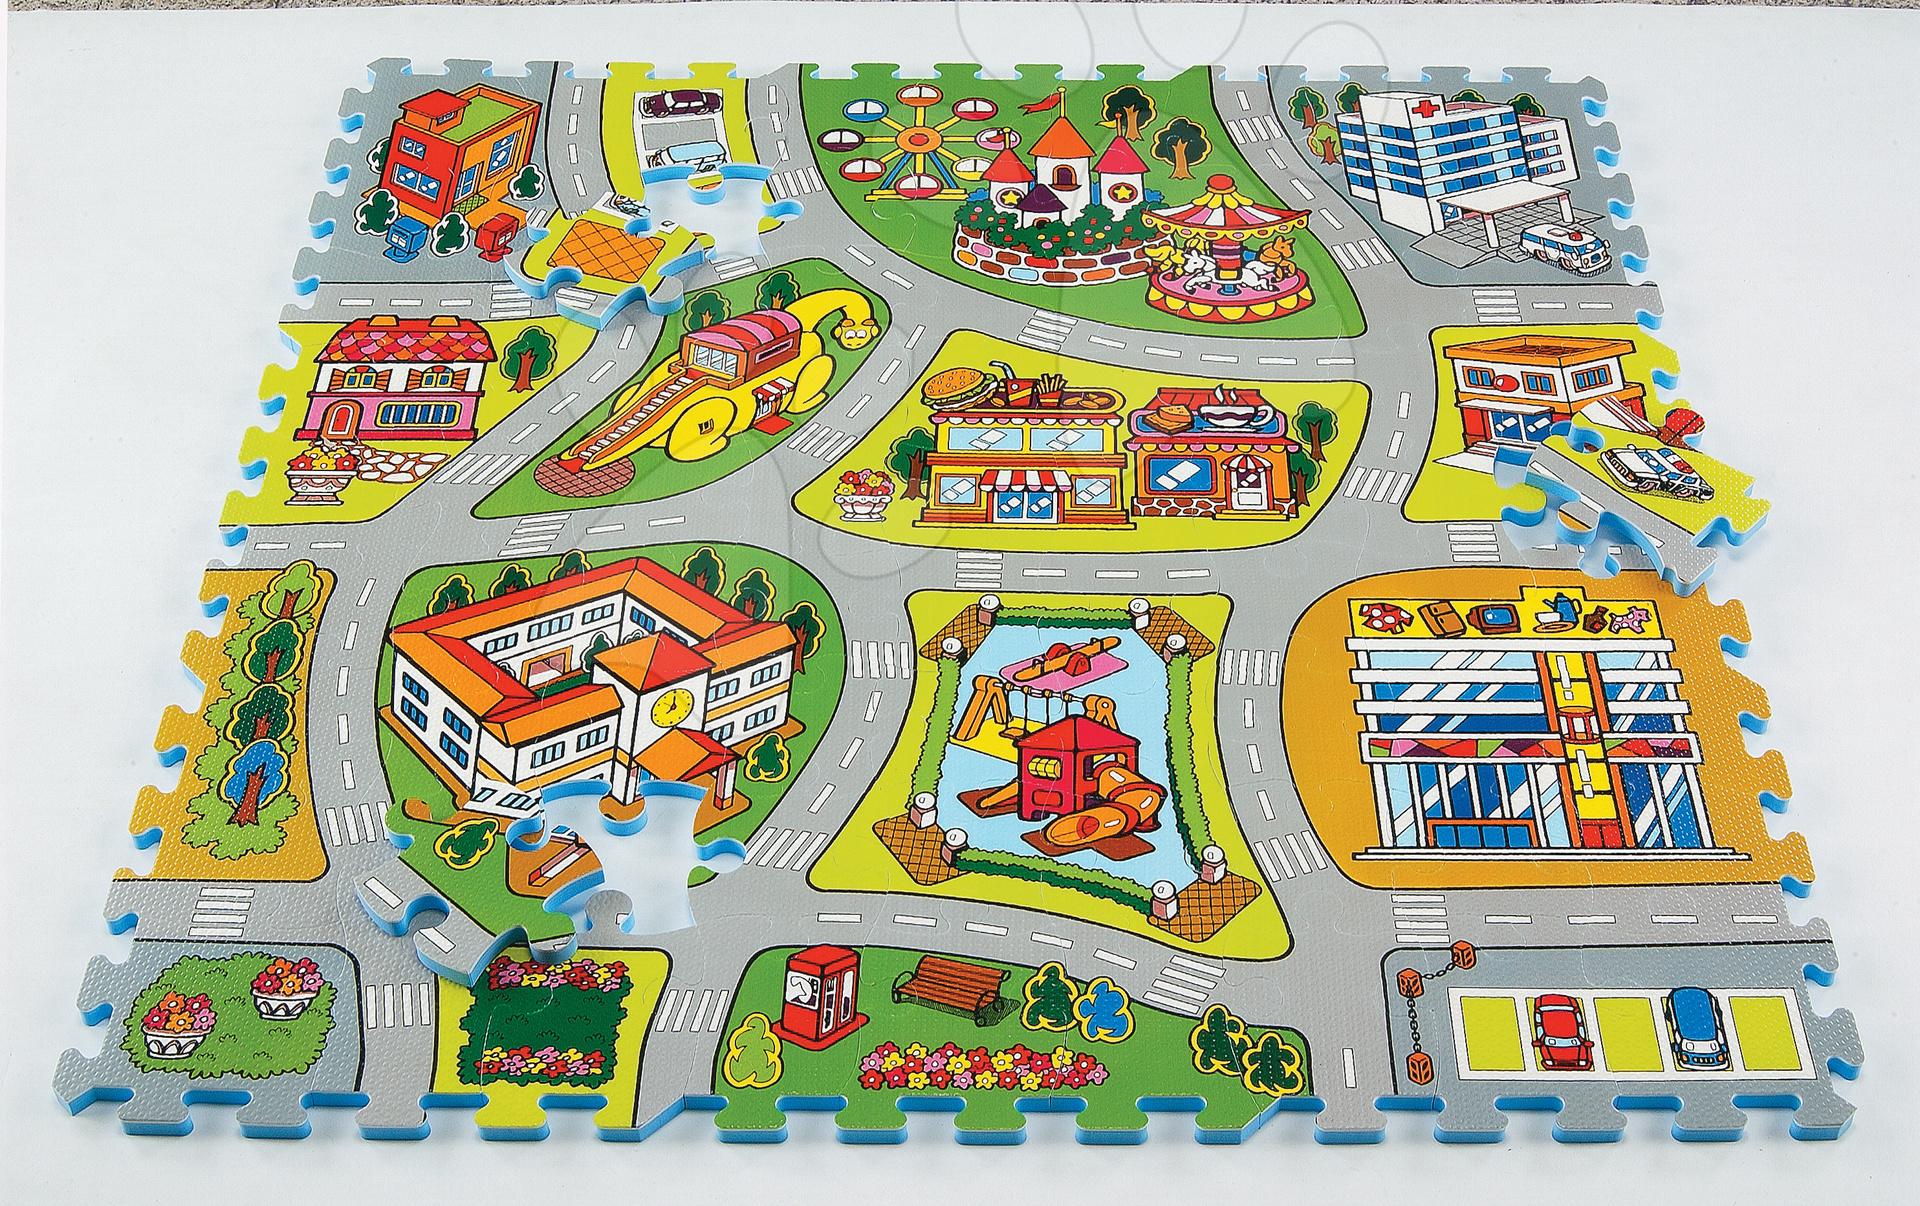 Penové puzzle - Penové puzzle City Map - Mapa mesta Lee 81 dielov 92*92*1,4 cm od 0 mes